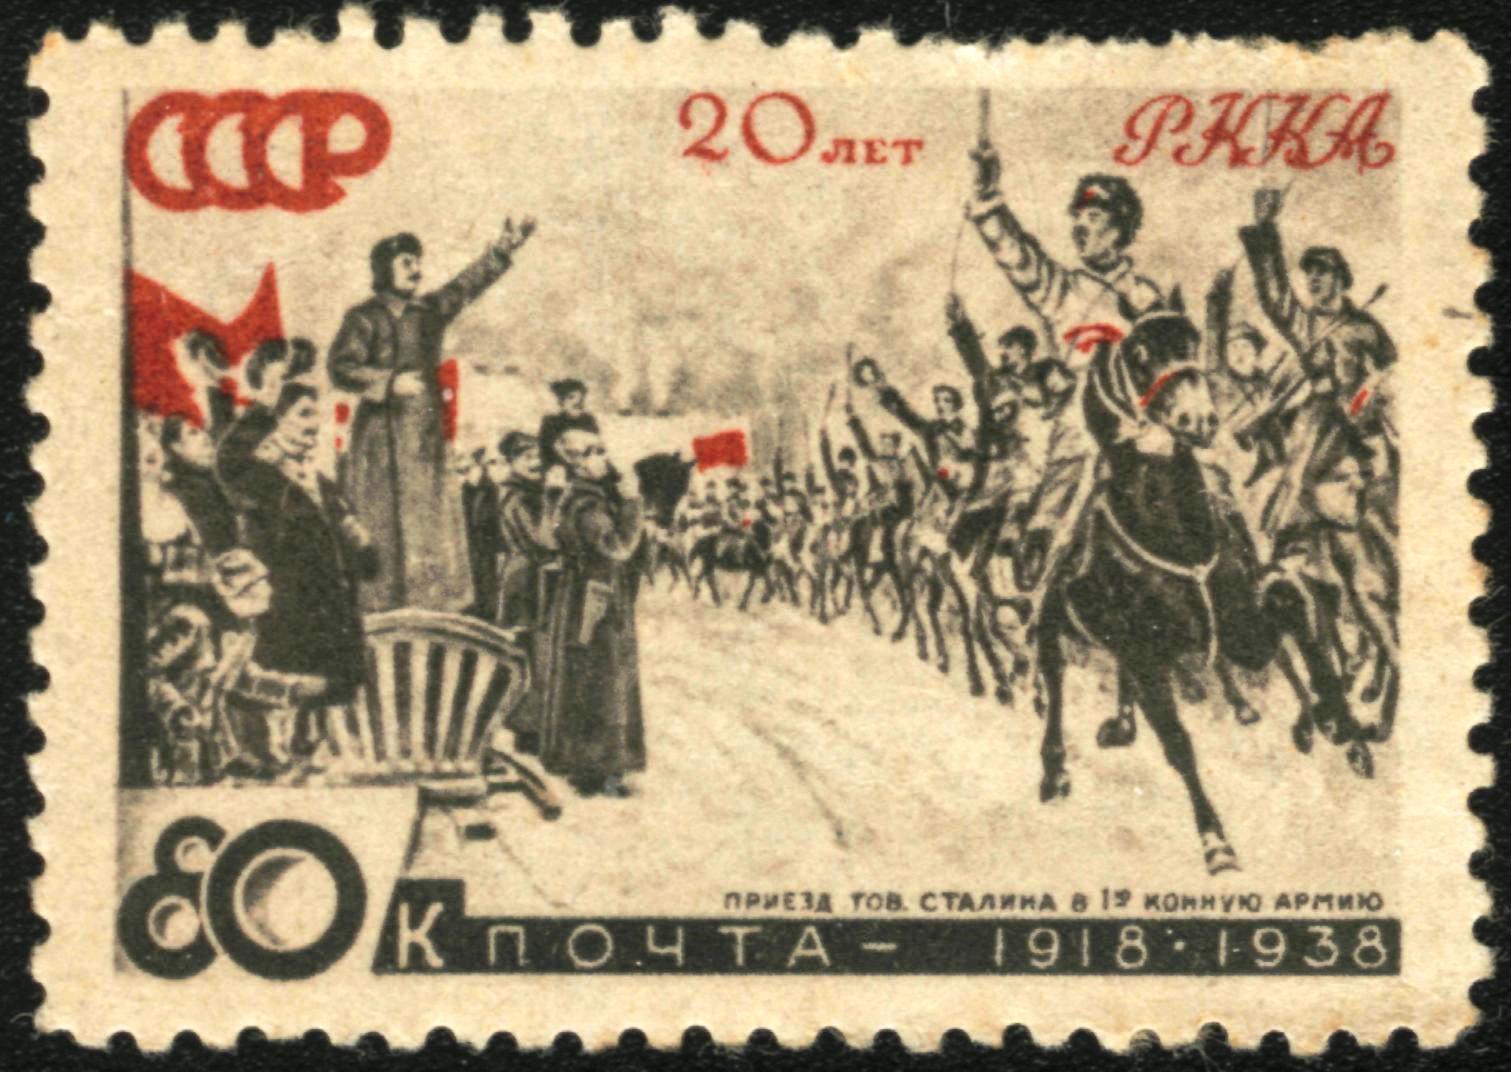 http://dic.academic.ru/pictures/wiki/files/50/20_let_RKKA._Priezd_tov._Stalina_v_1_Konnuyu_armiyu.jpg